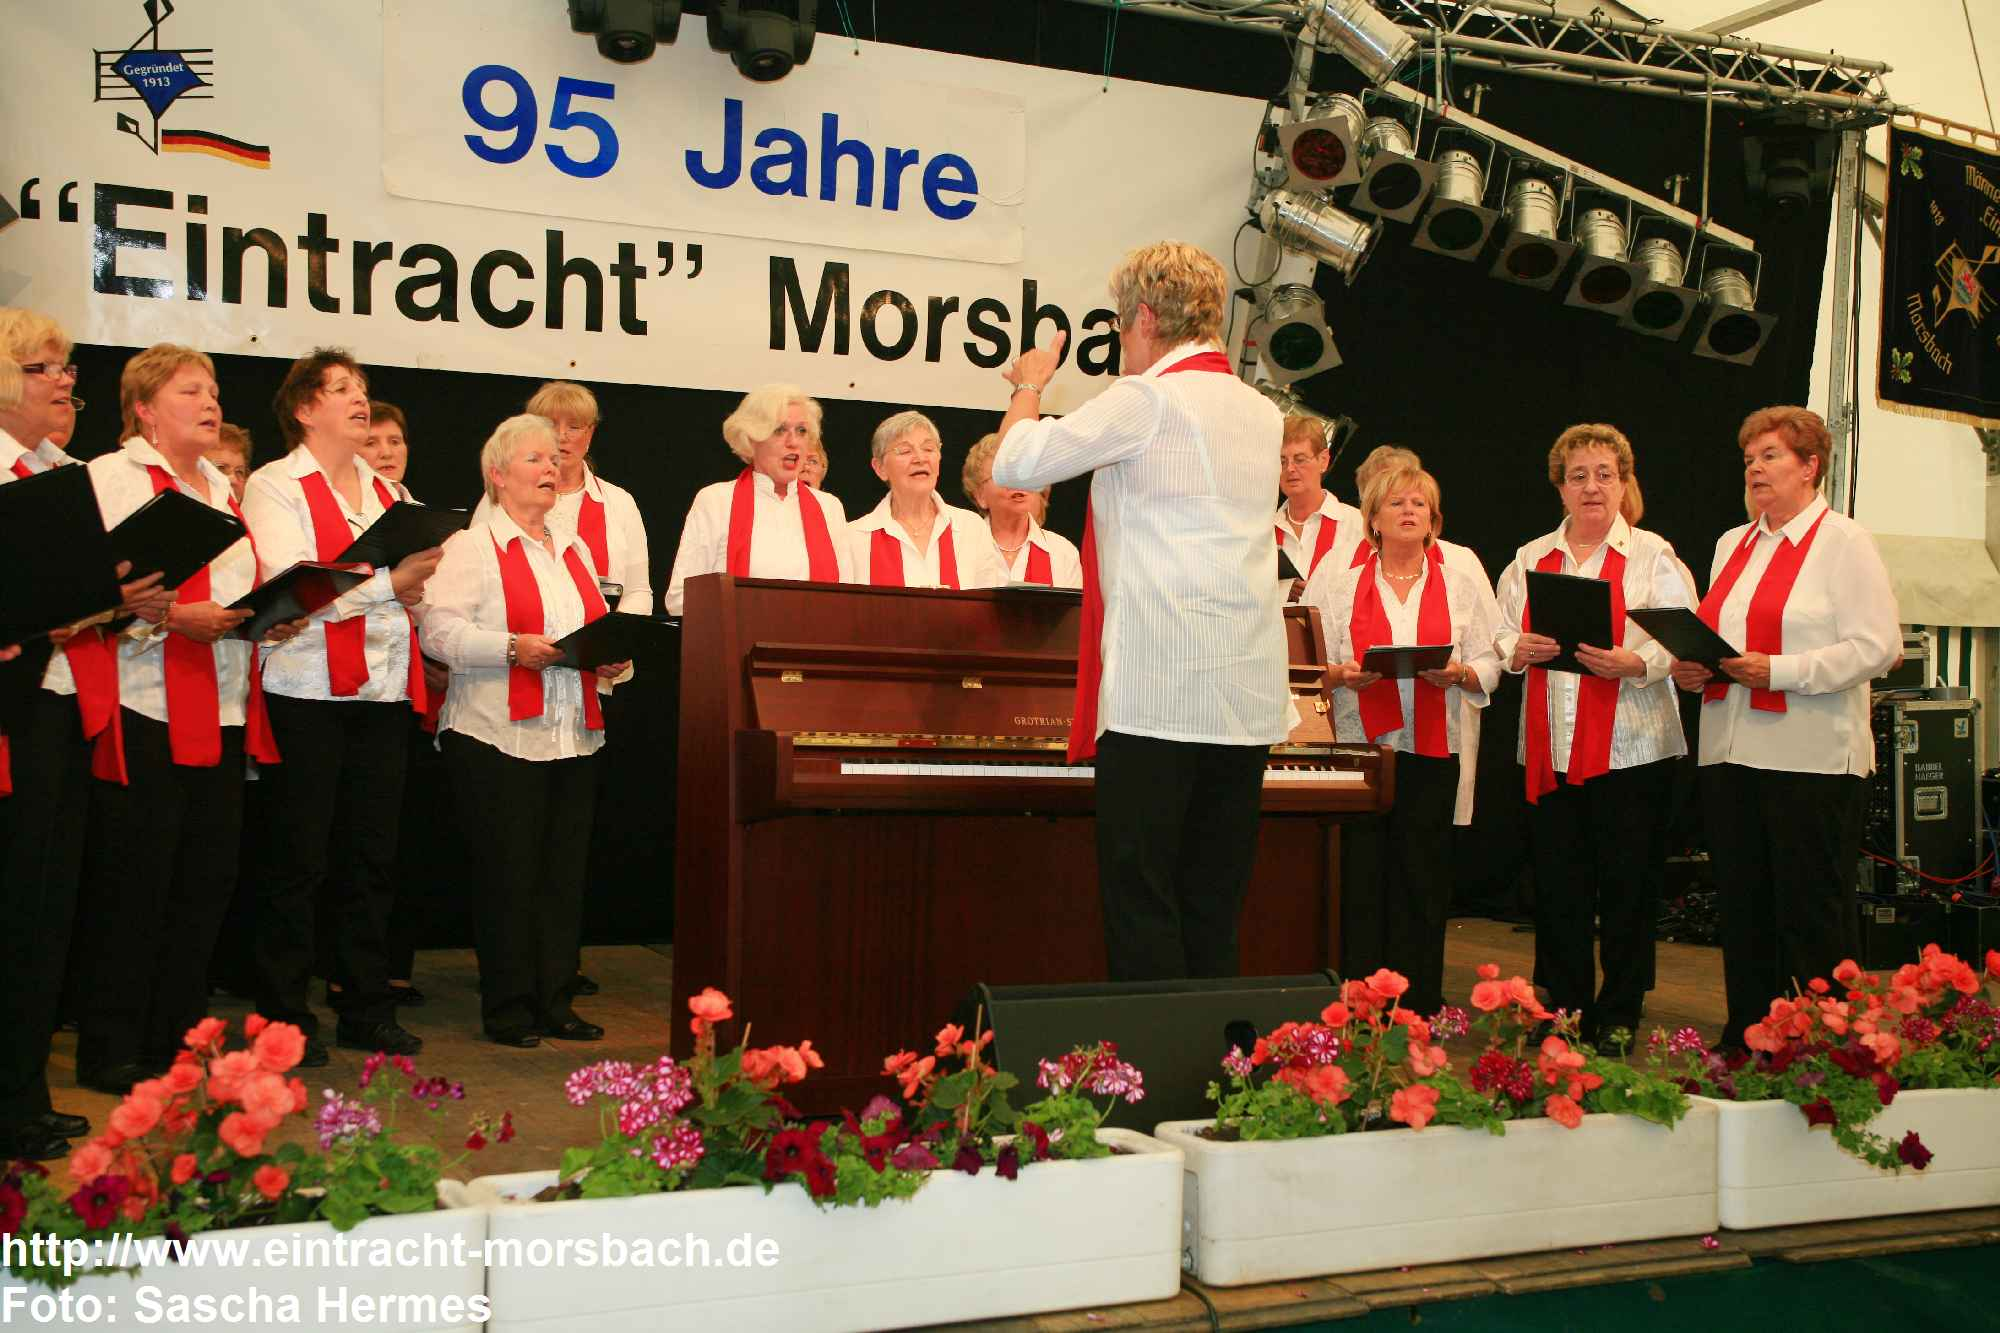 95-jahriges-jubilaum-251